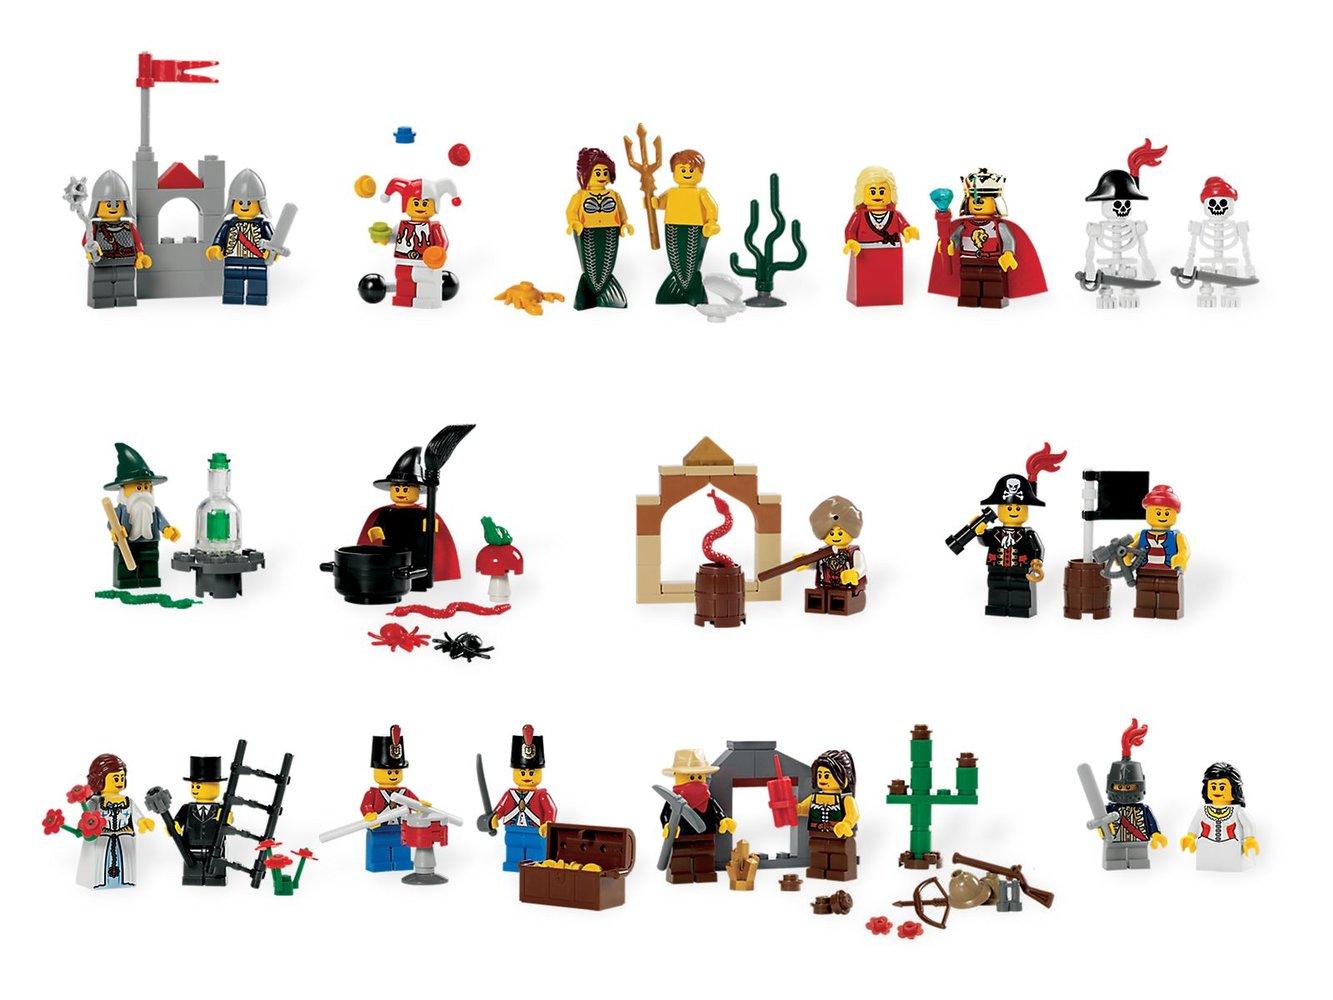 Fairytale and Historic Minifigures